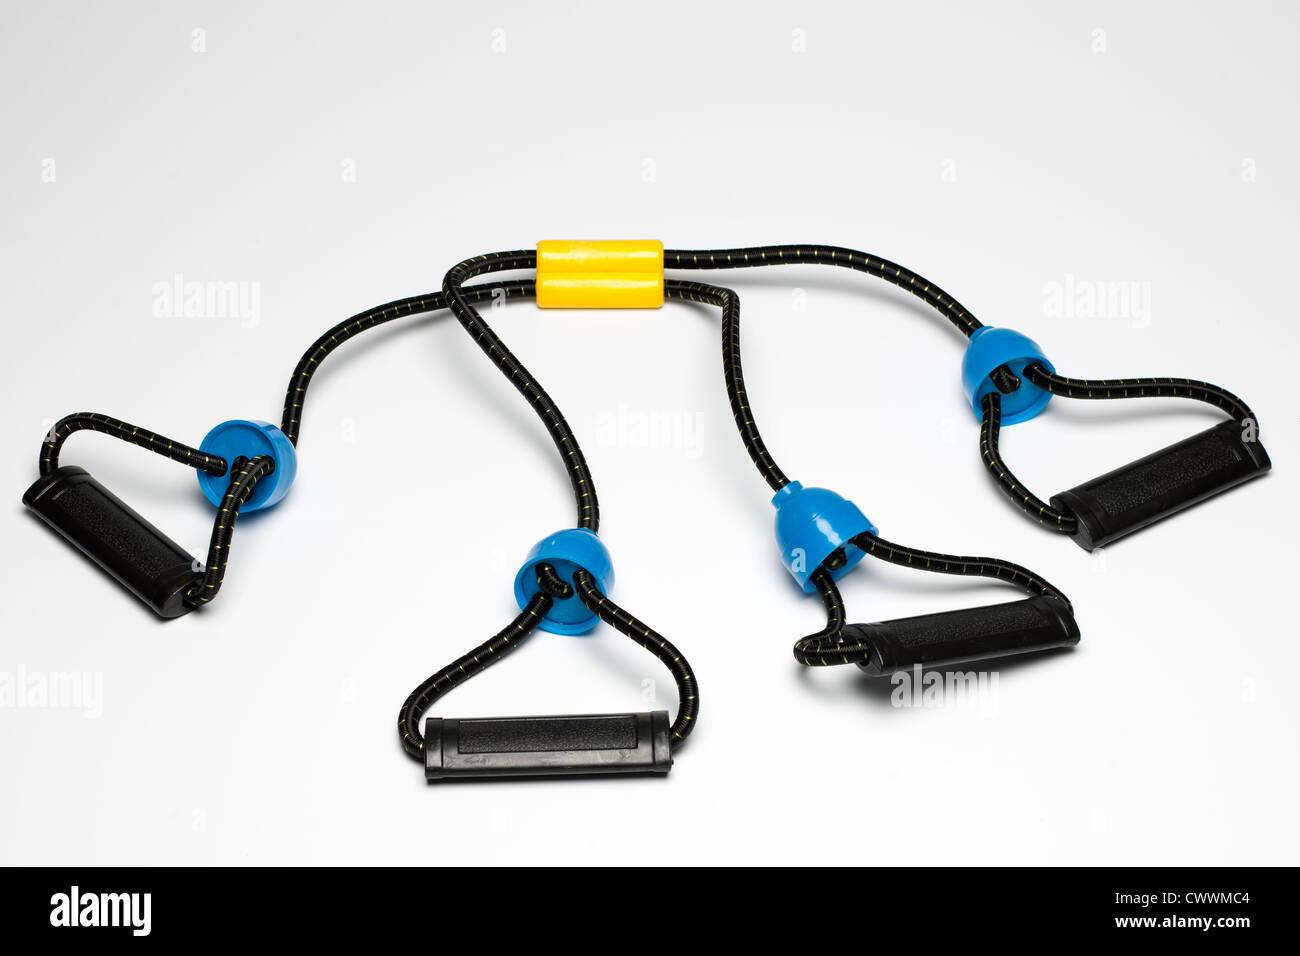 Dynasizer body trimmer - Stock Image